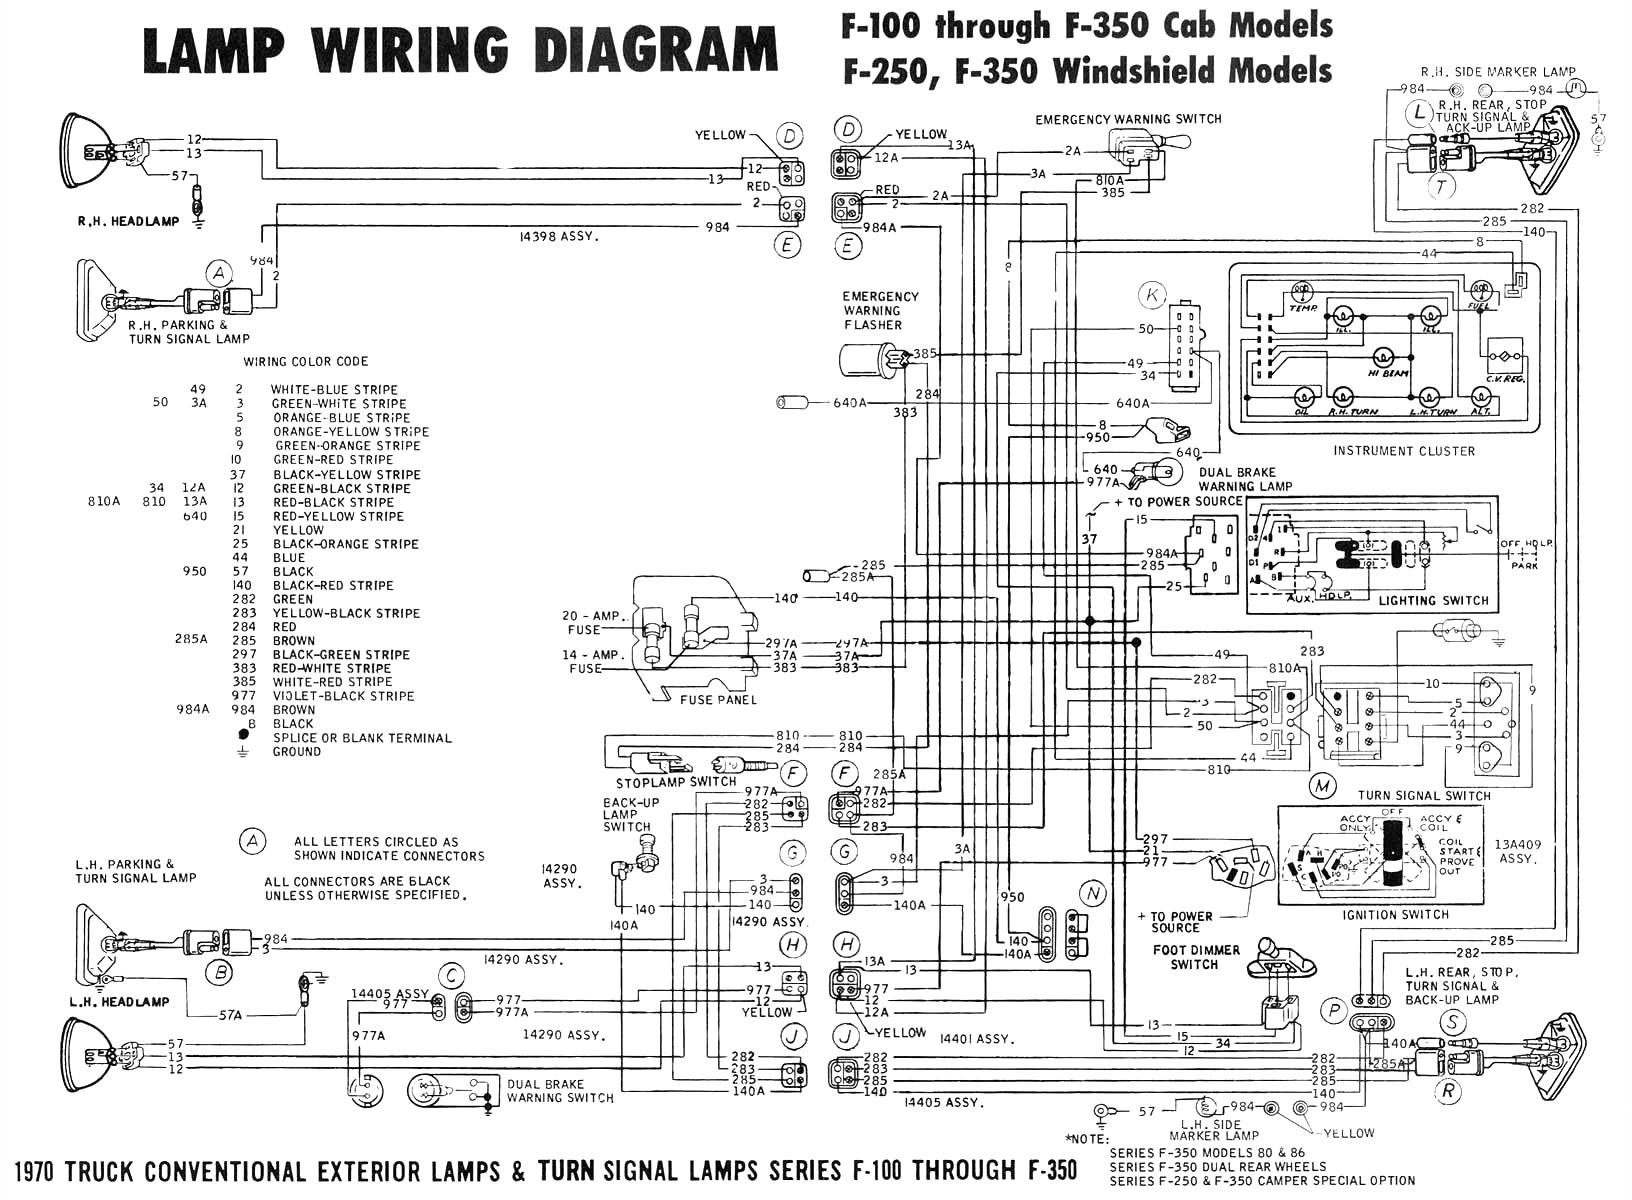 2001 e150 wiring diagram schema diagram database 2001 ford e150 radio wiring diagram 2001 ford e150 wiring diagram